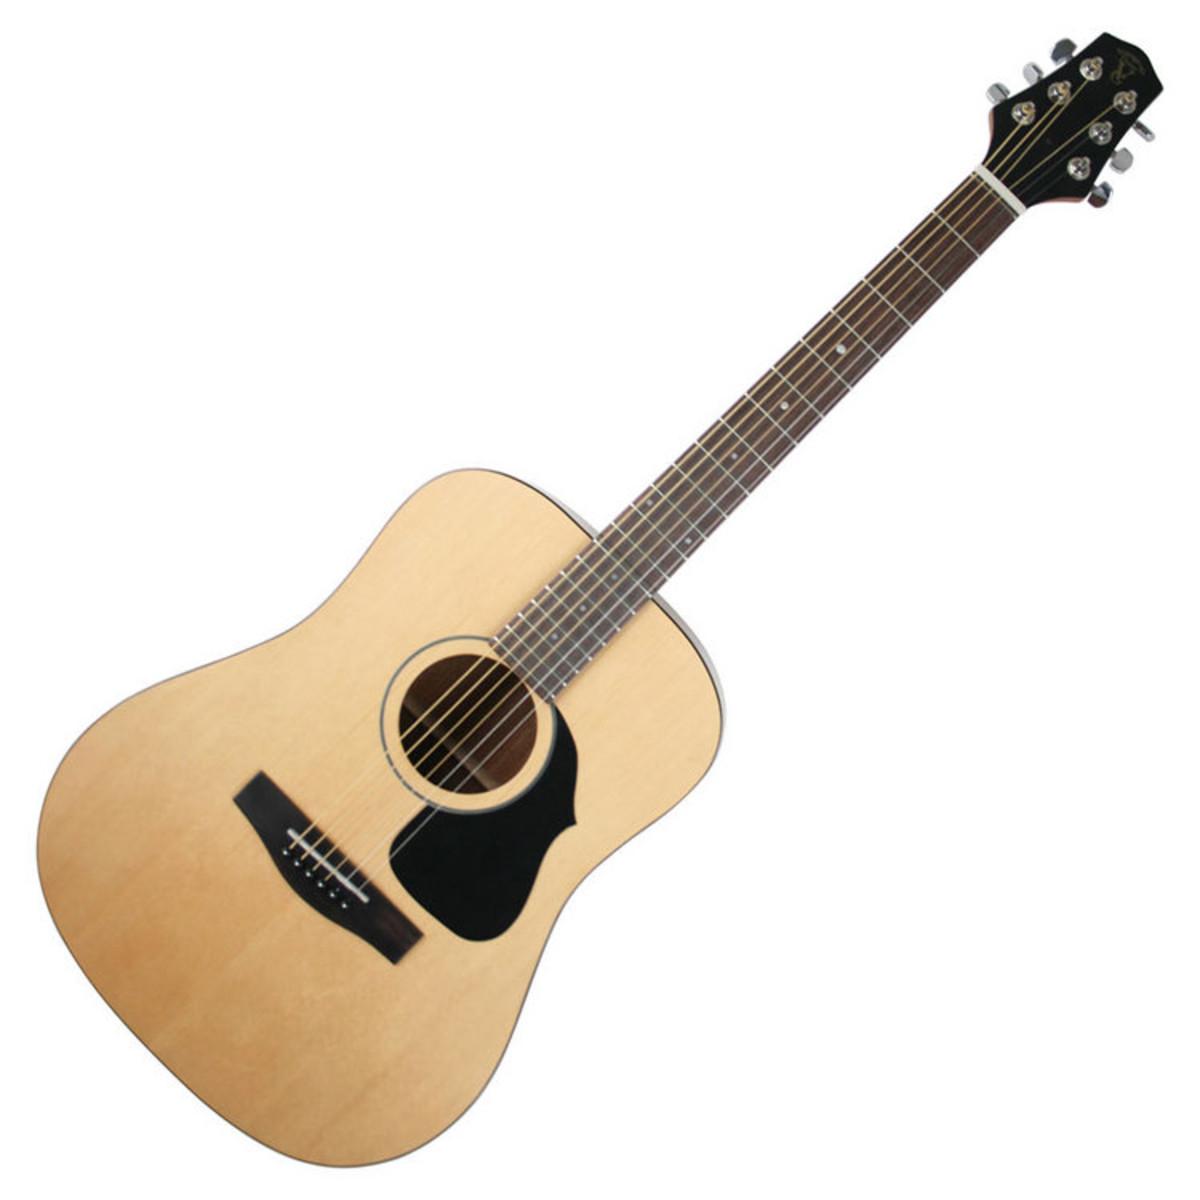 voyage air vaom 04 folding acoustic travel guitar at gear4music. Black Bedroom Furniture Sets. Home Design Ideas